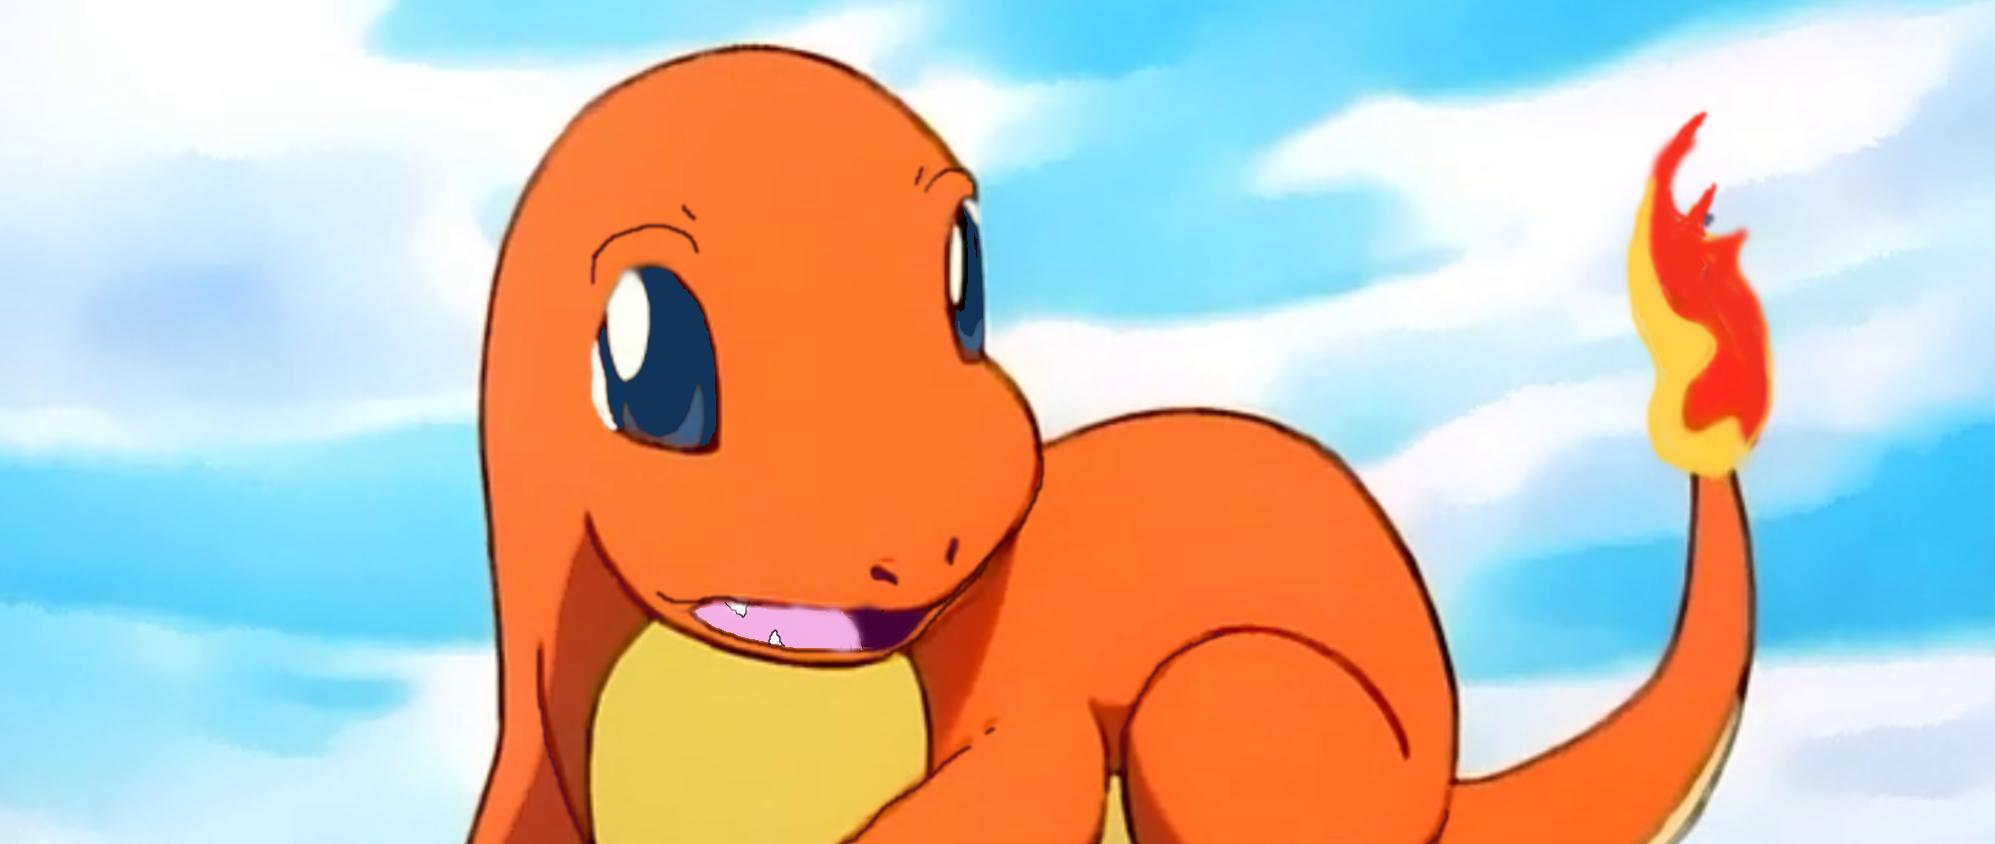 how to change pokemon nickname traded in sun